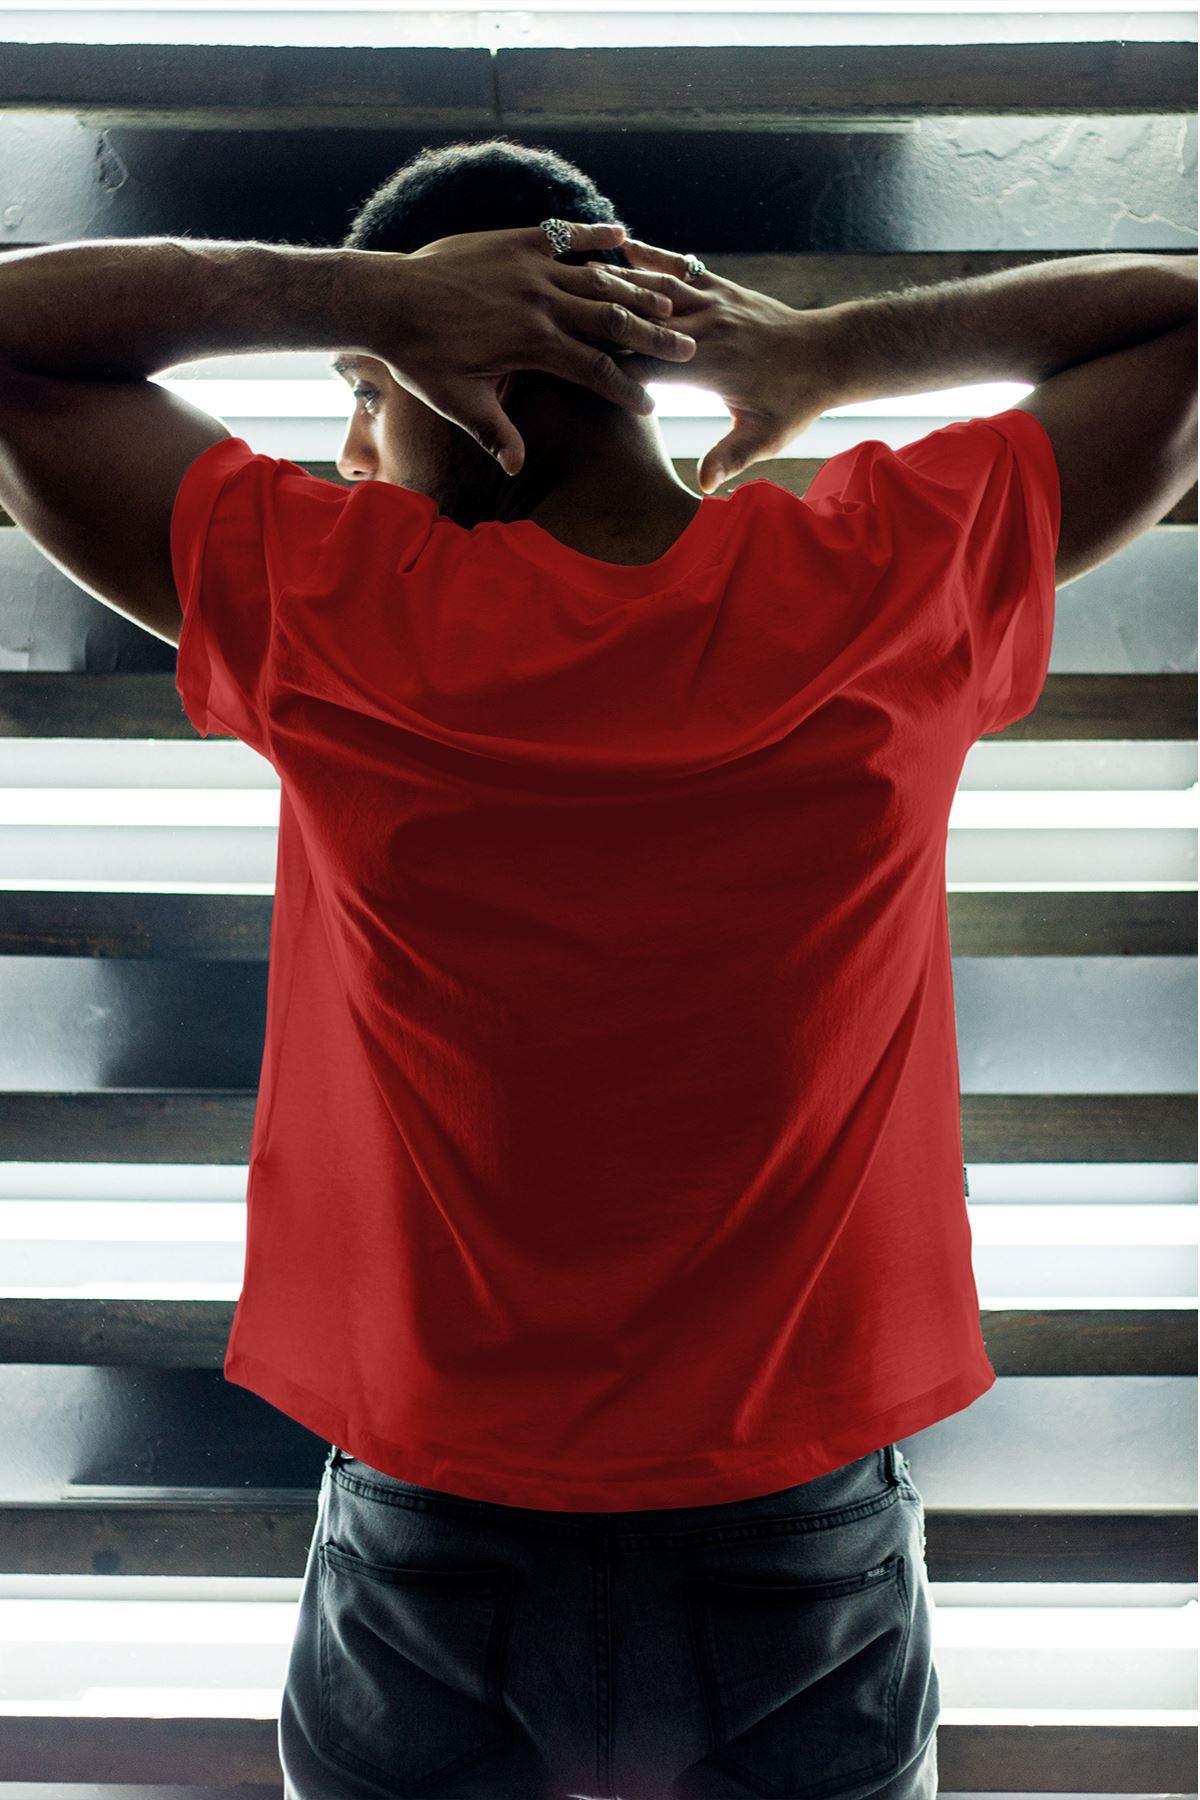 Boston Celtics 28 Kırmızı Erkek Oversize Tshirt - Tişört